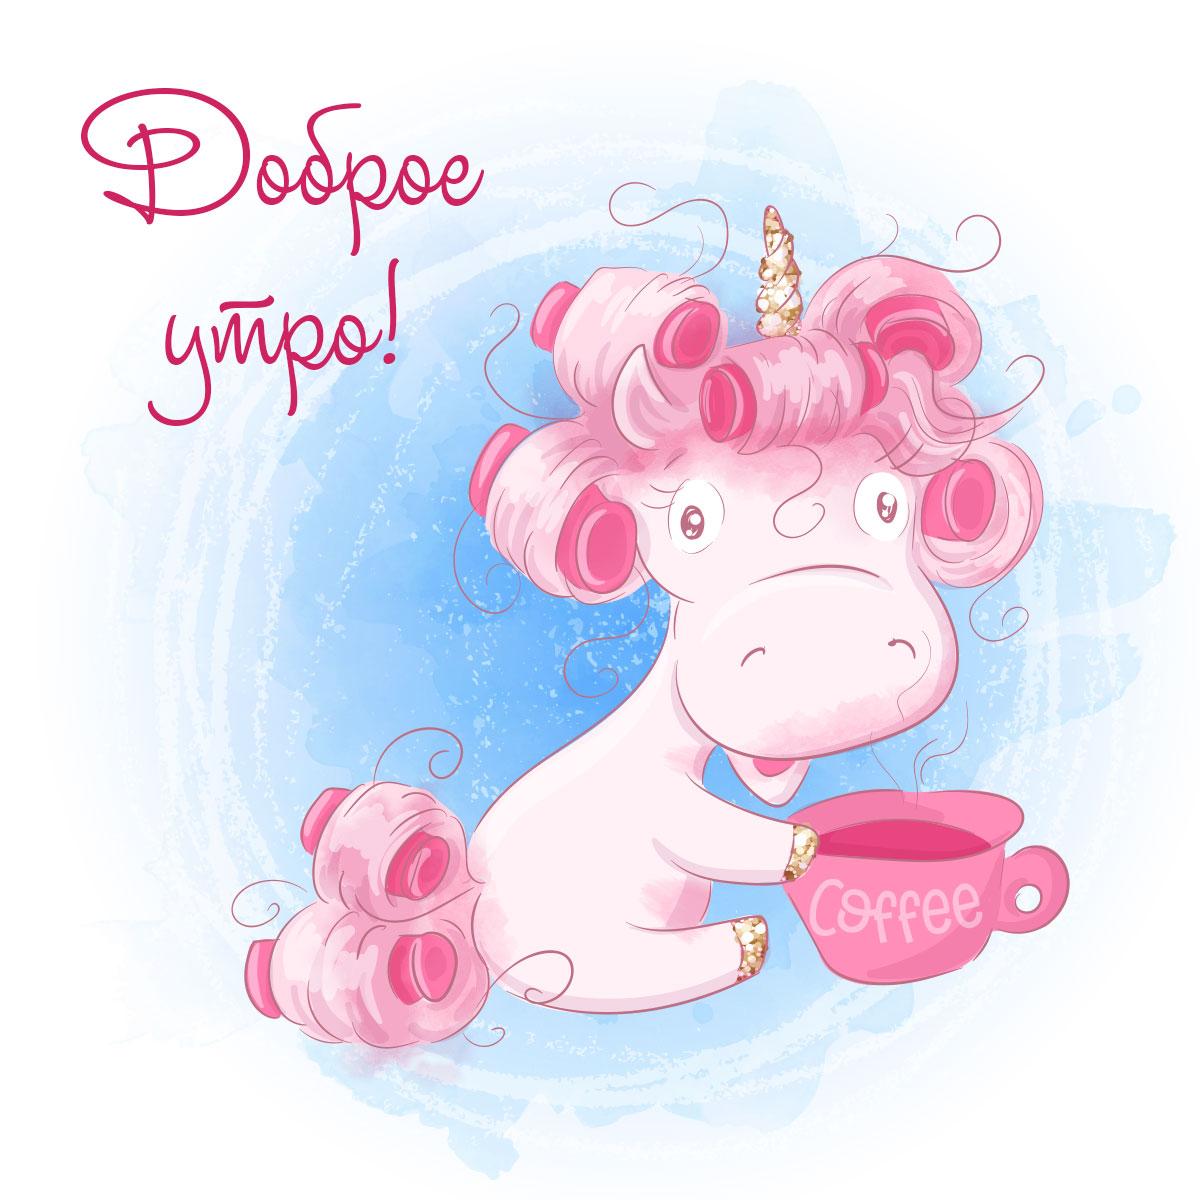 Рисунок розового единорога в бигуди на хвосте и гриве возле кружки кофе.